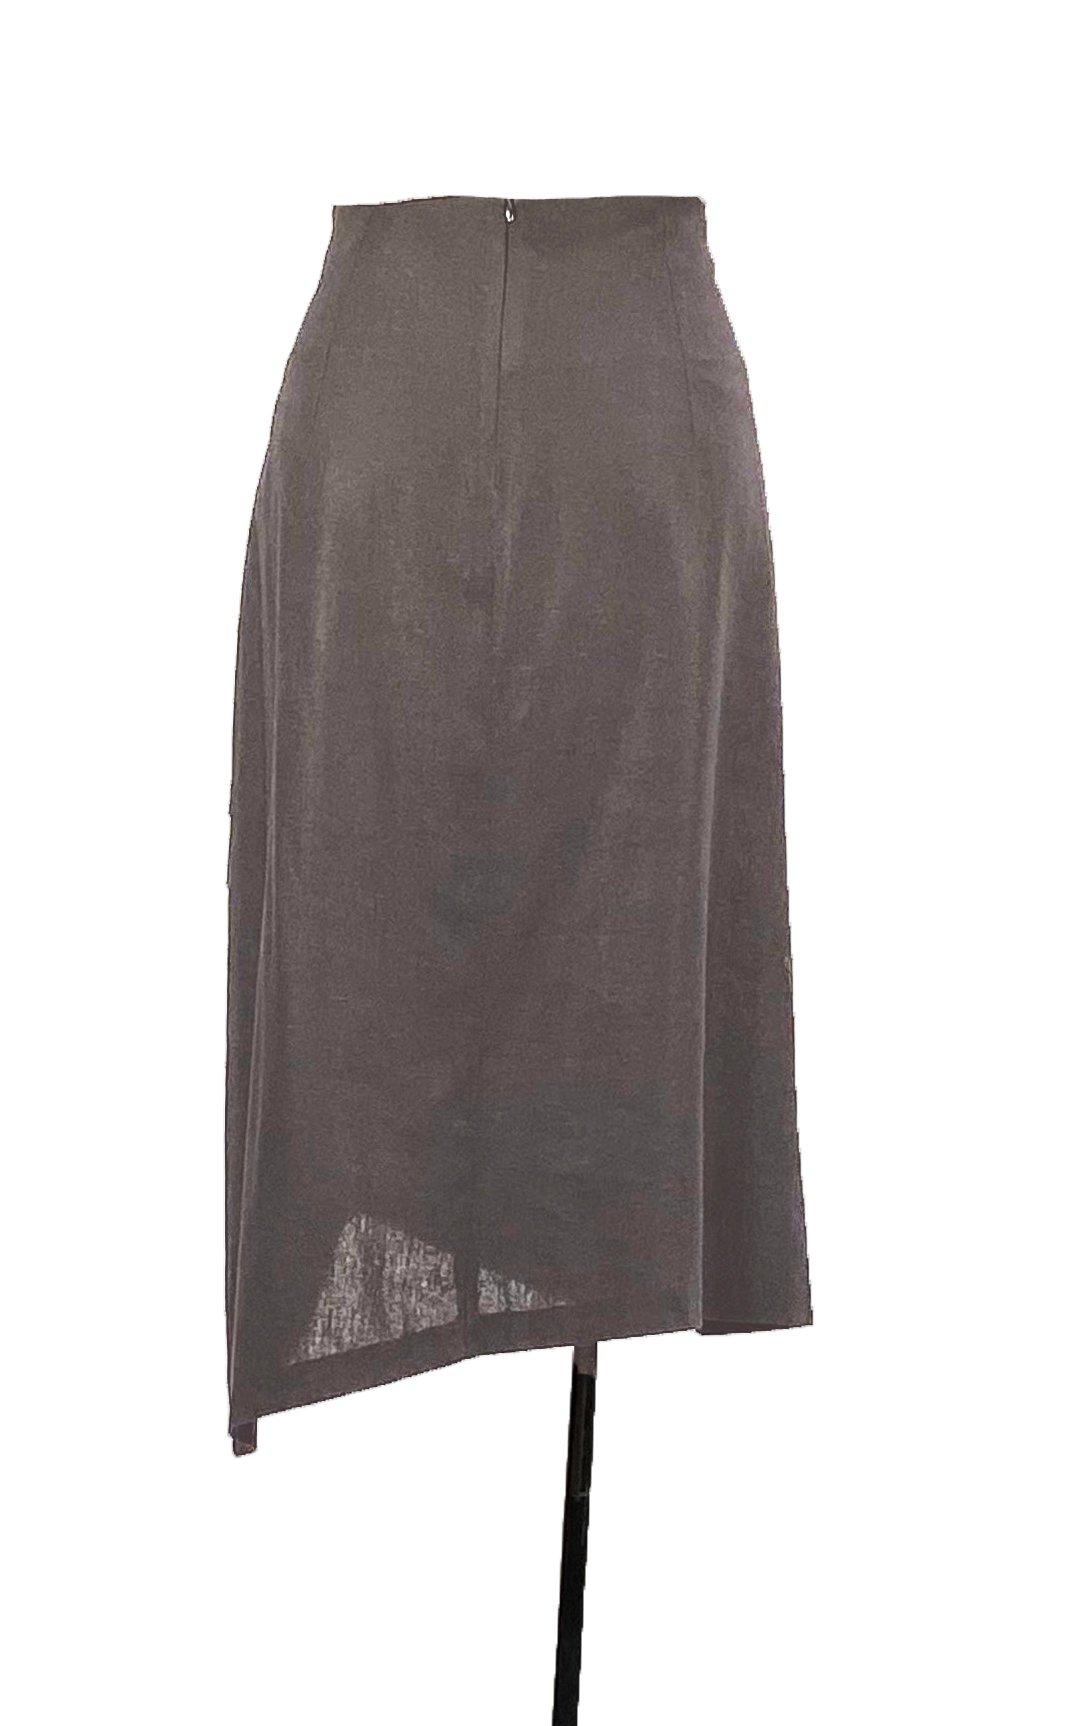 Image of Bauhaus Skirt (Gray)